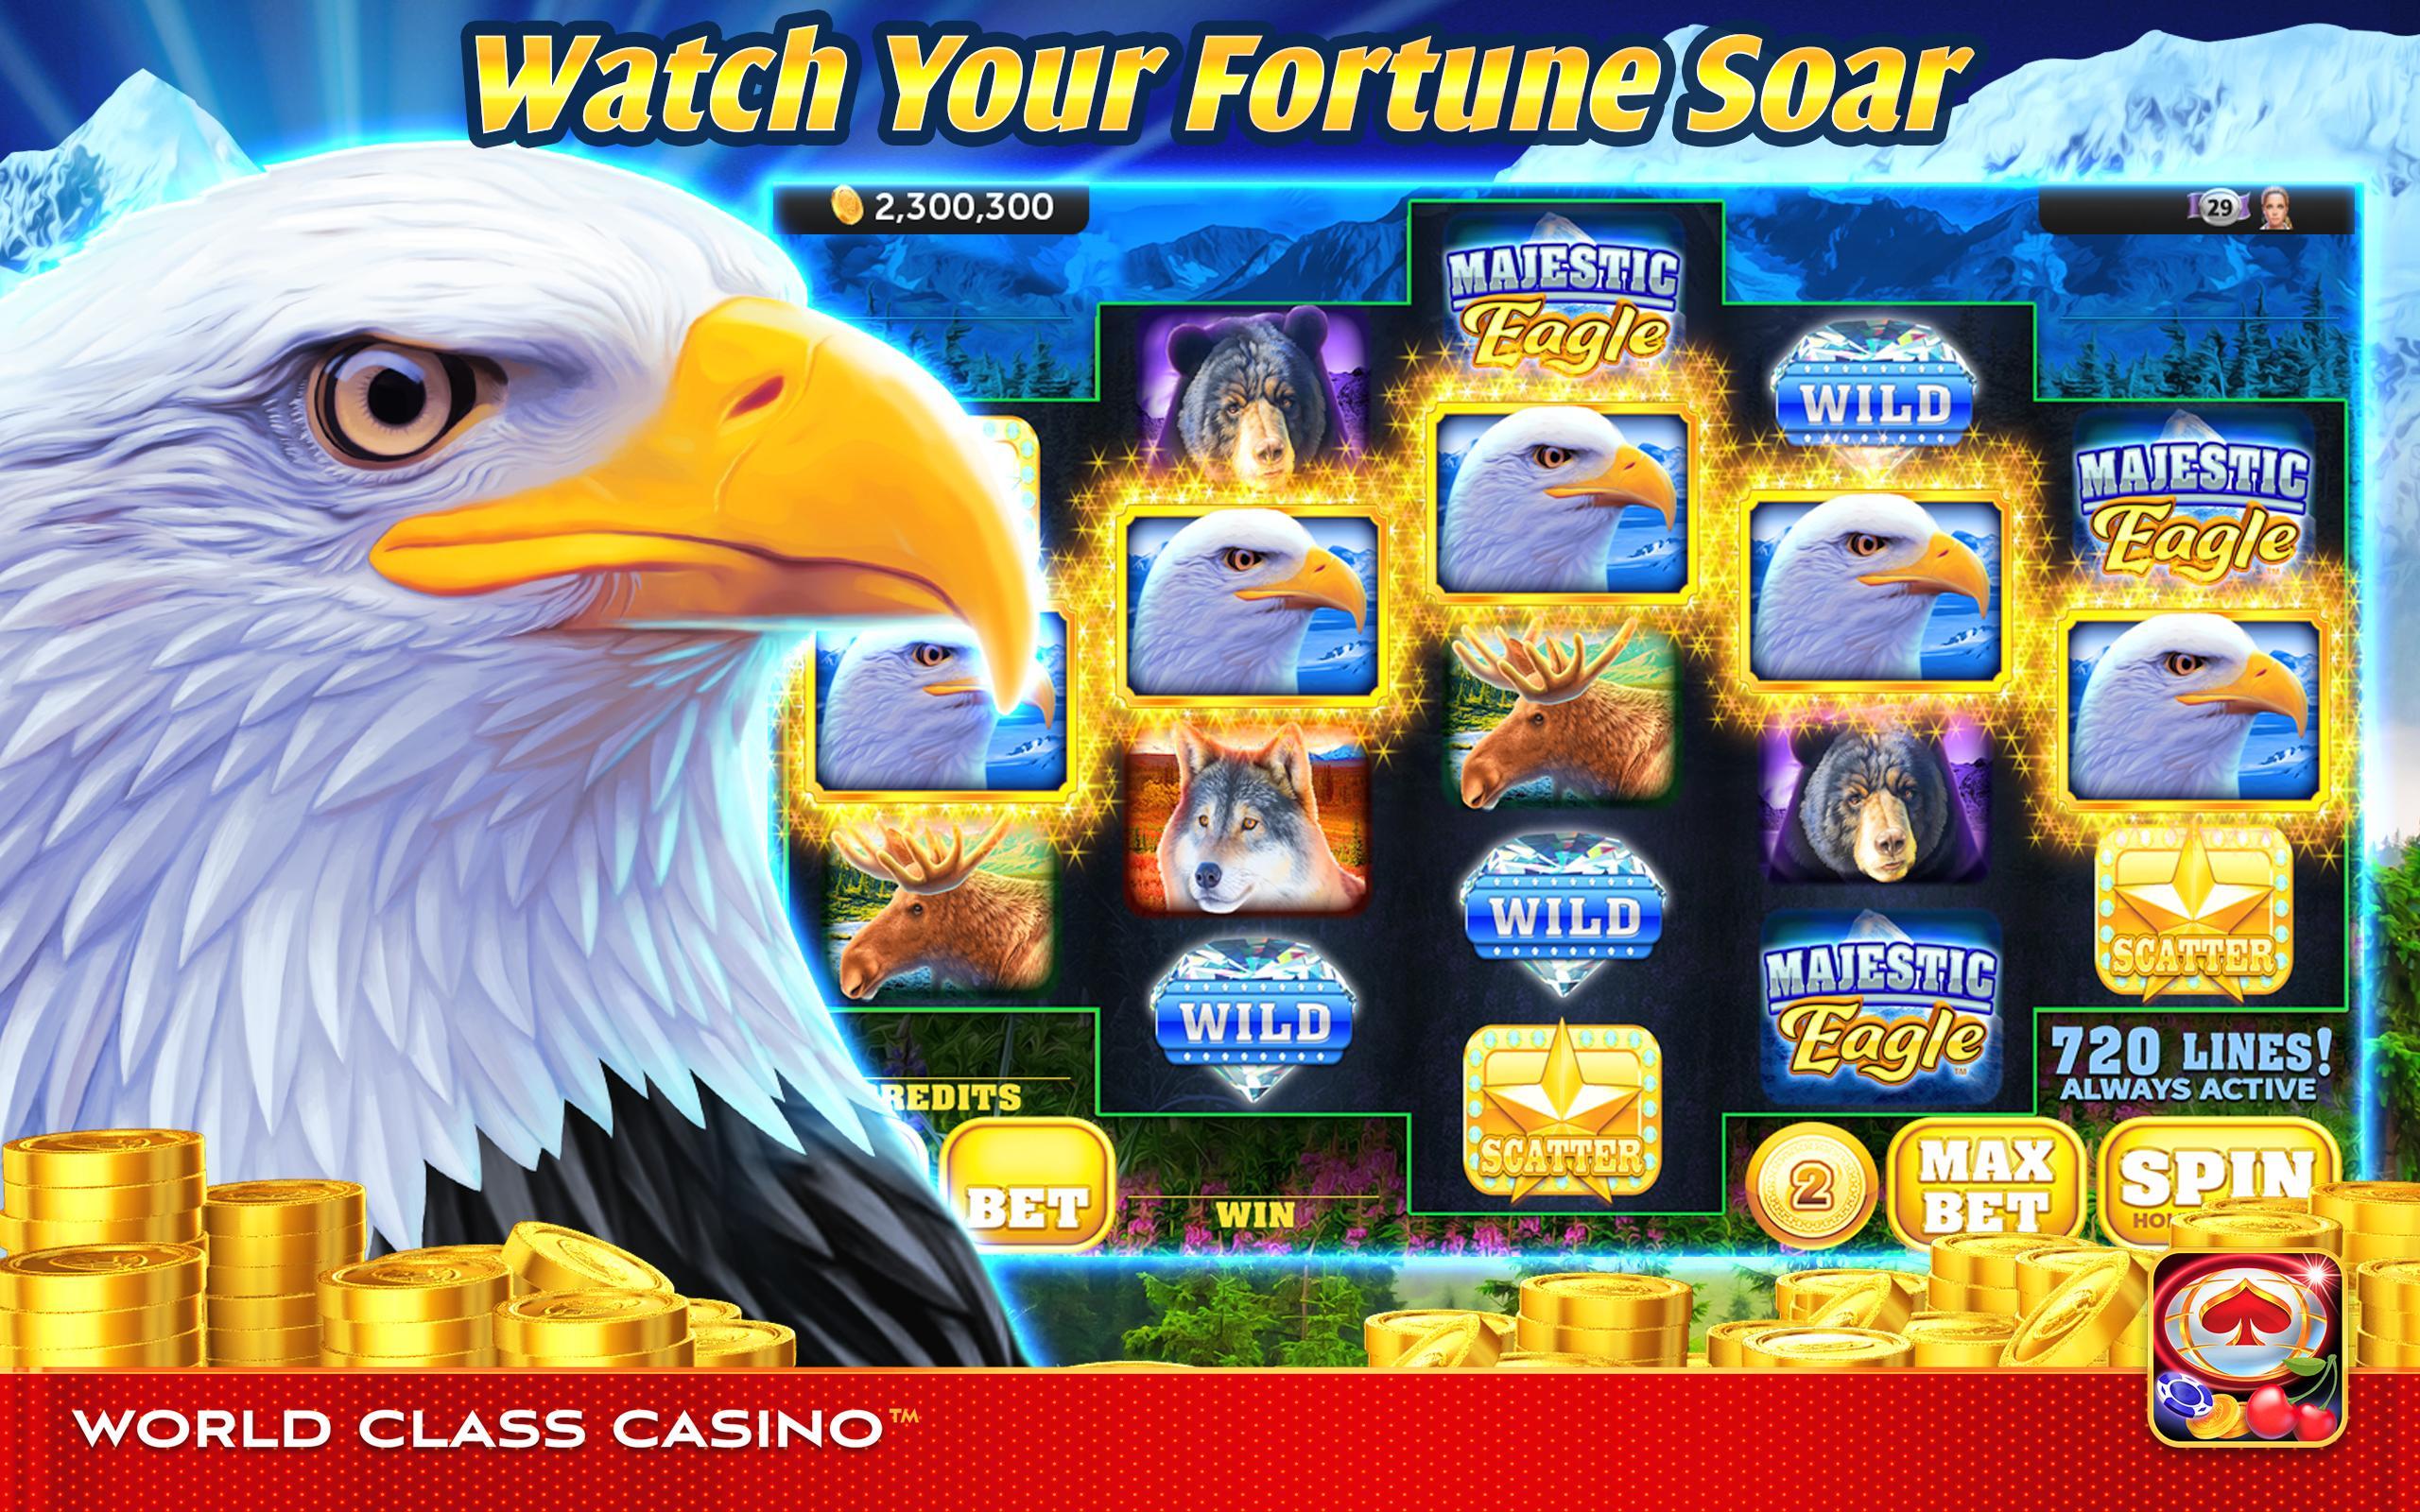 World Class Casino Slots, Blackjack & Poker Room 8.0.4 Screenshot 5